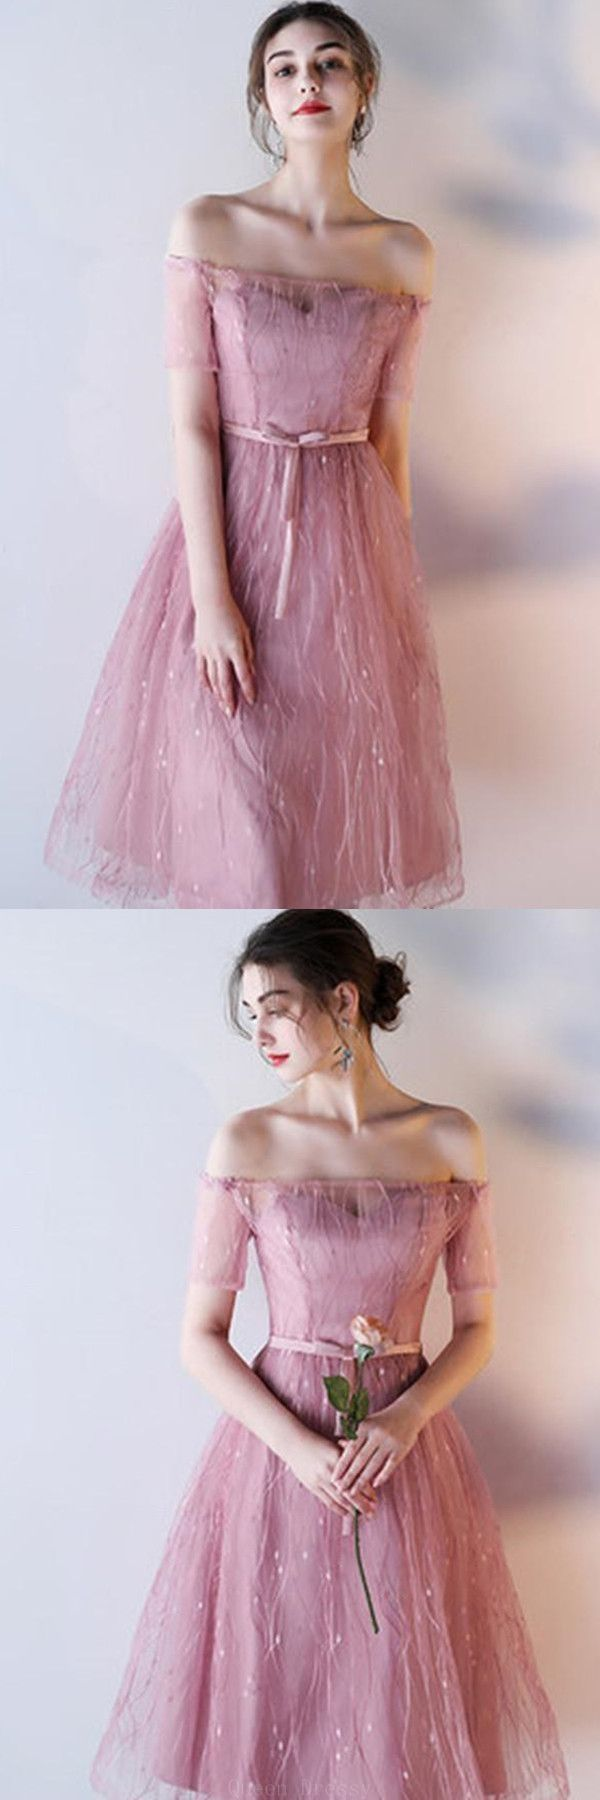 Custom made soft prom dresses lace aline prom dresses short prom